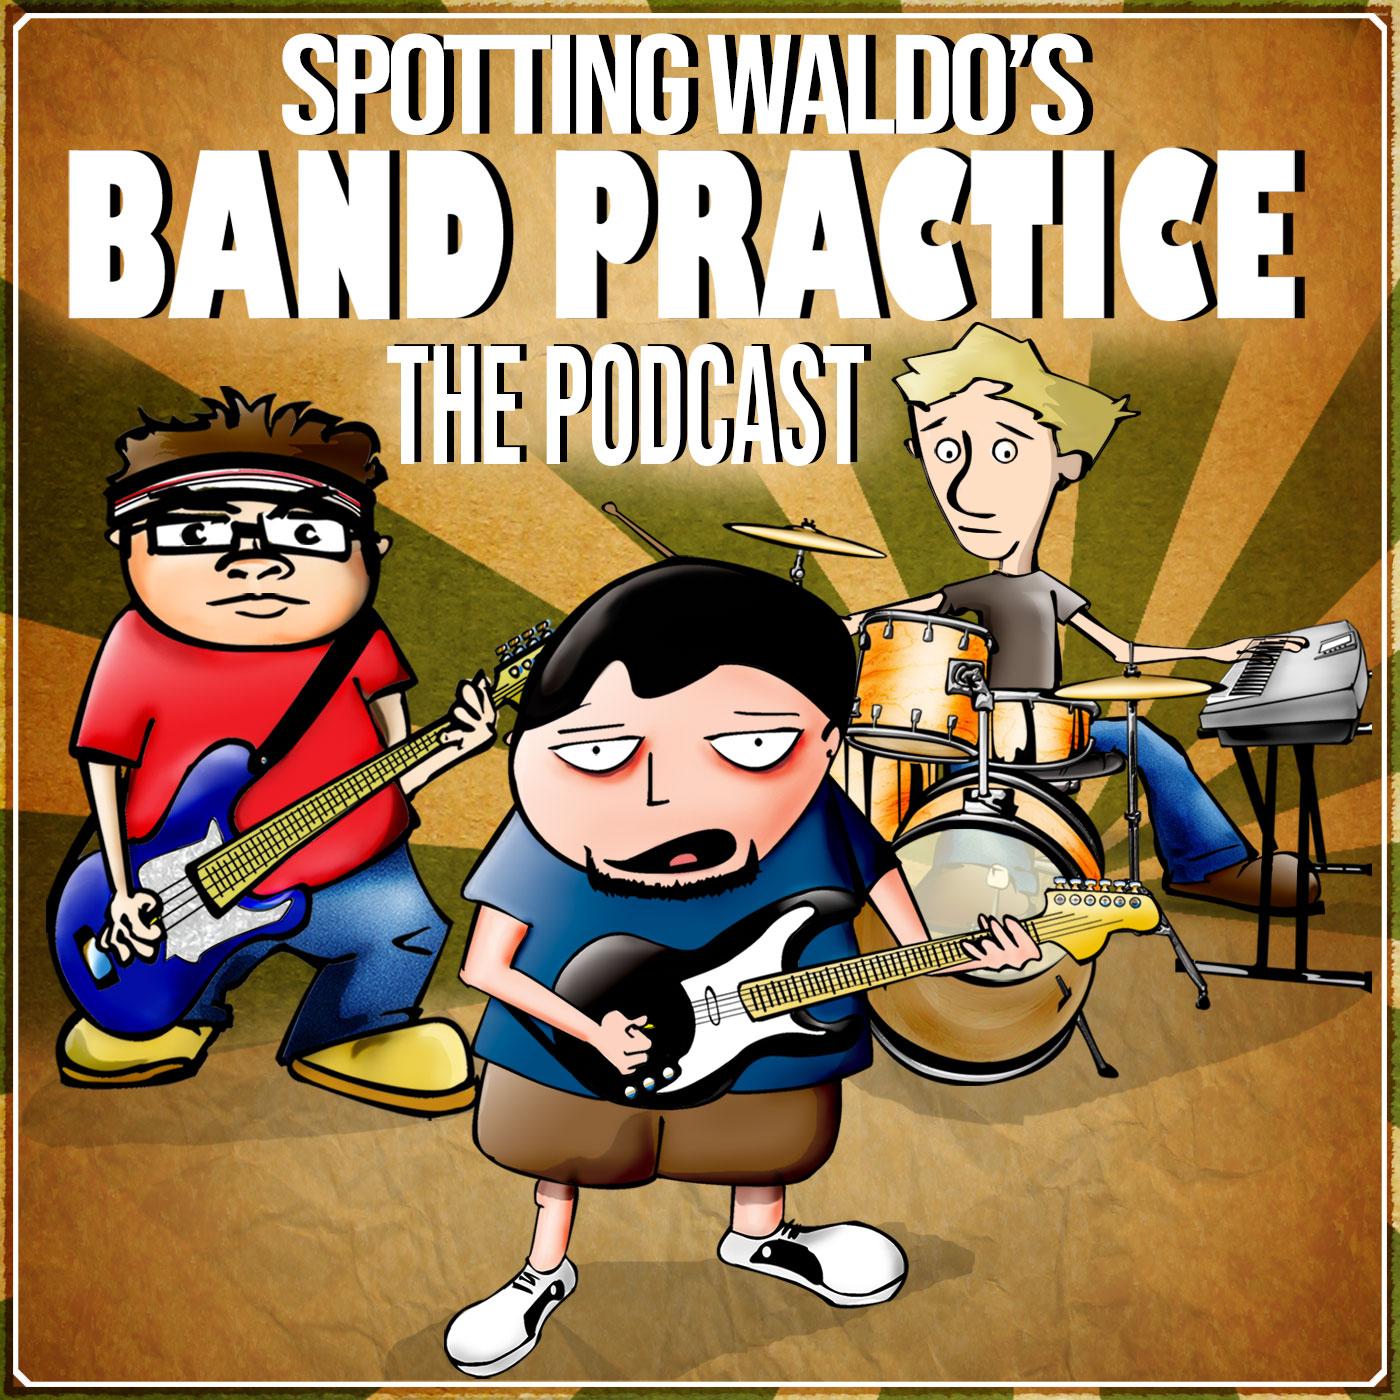 Band Practice show art